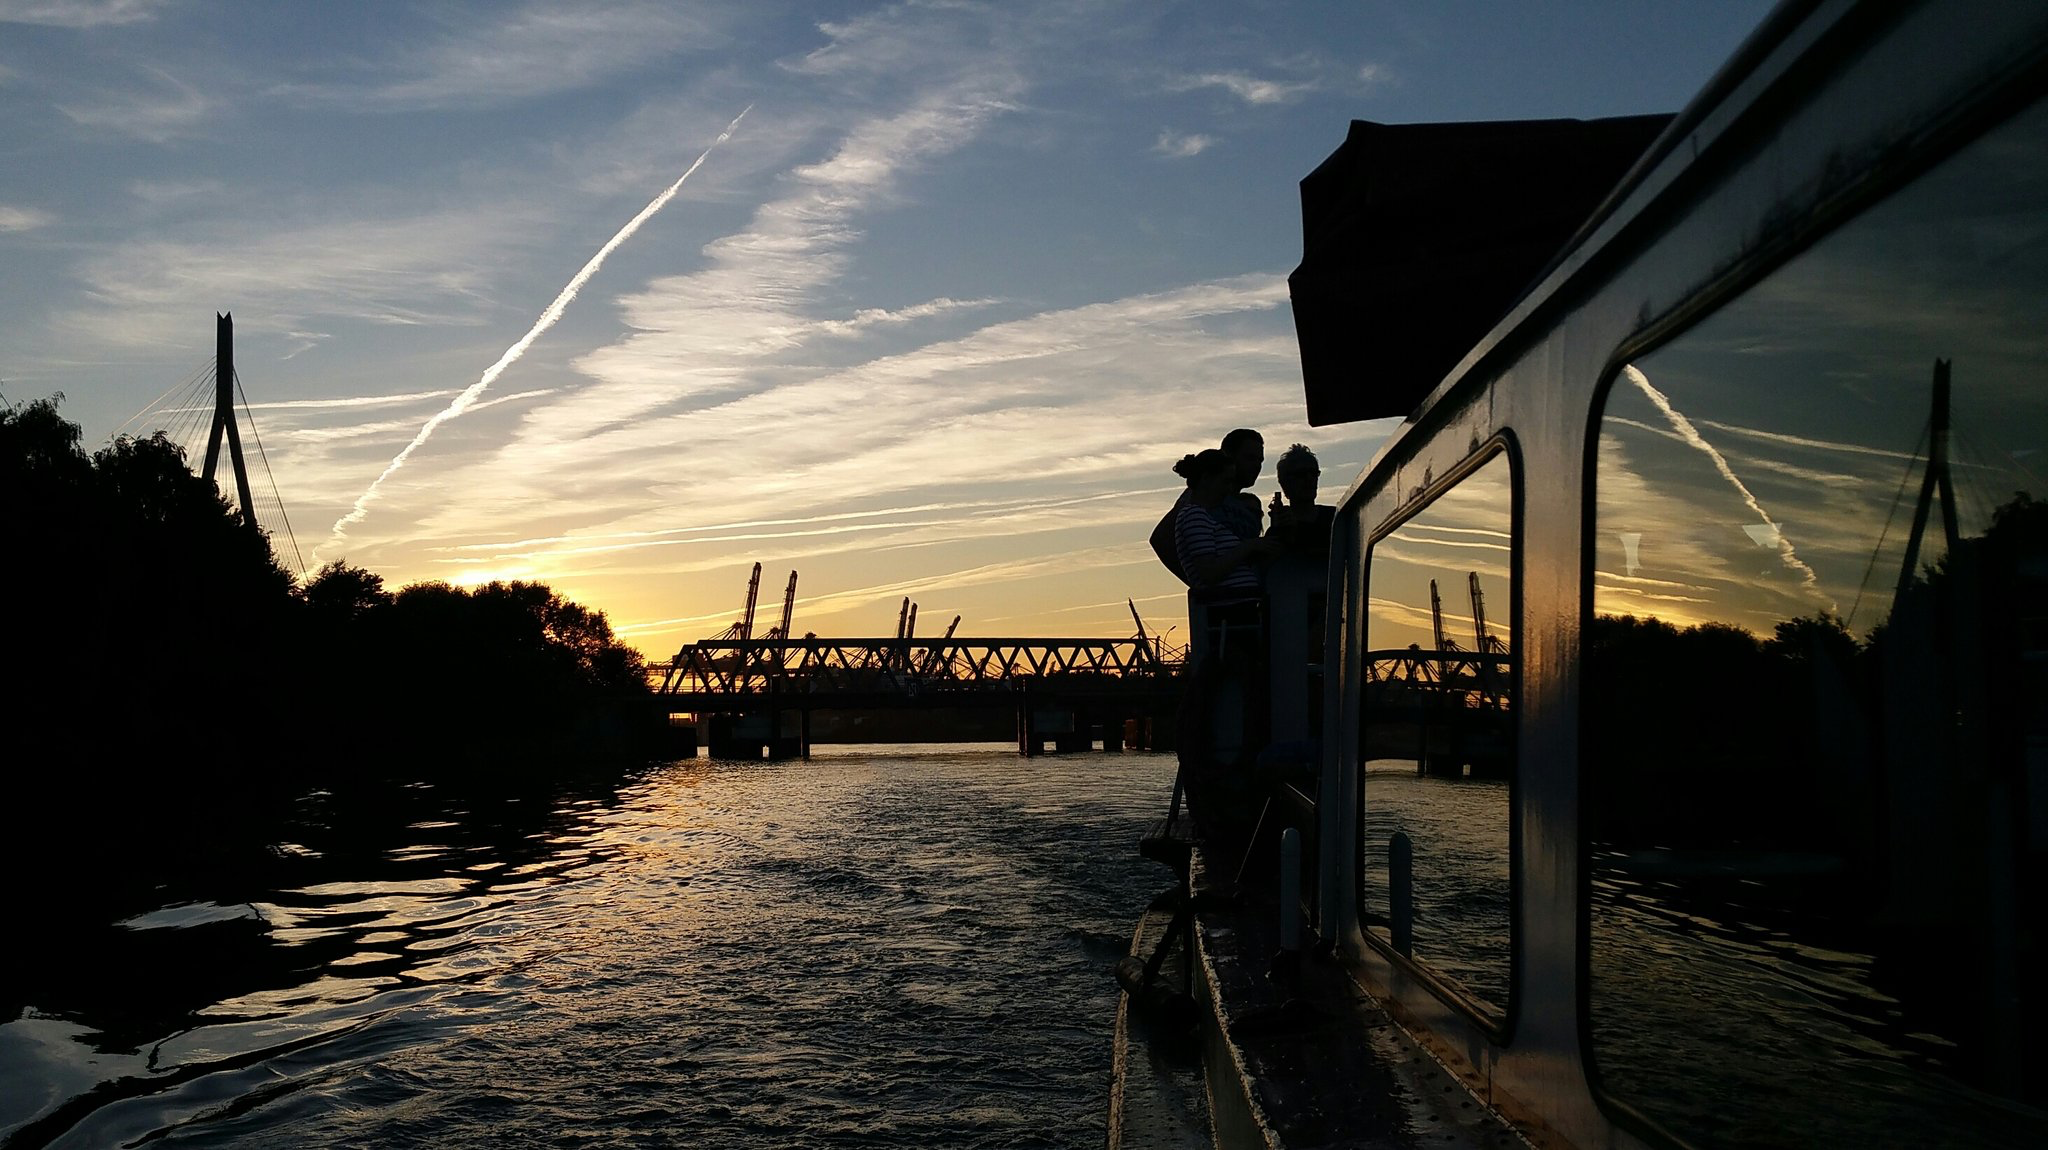 #Hamburg #Elbe #Sonnenuntergang #sunset